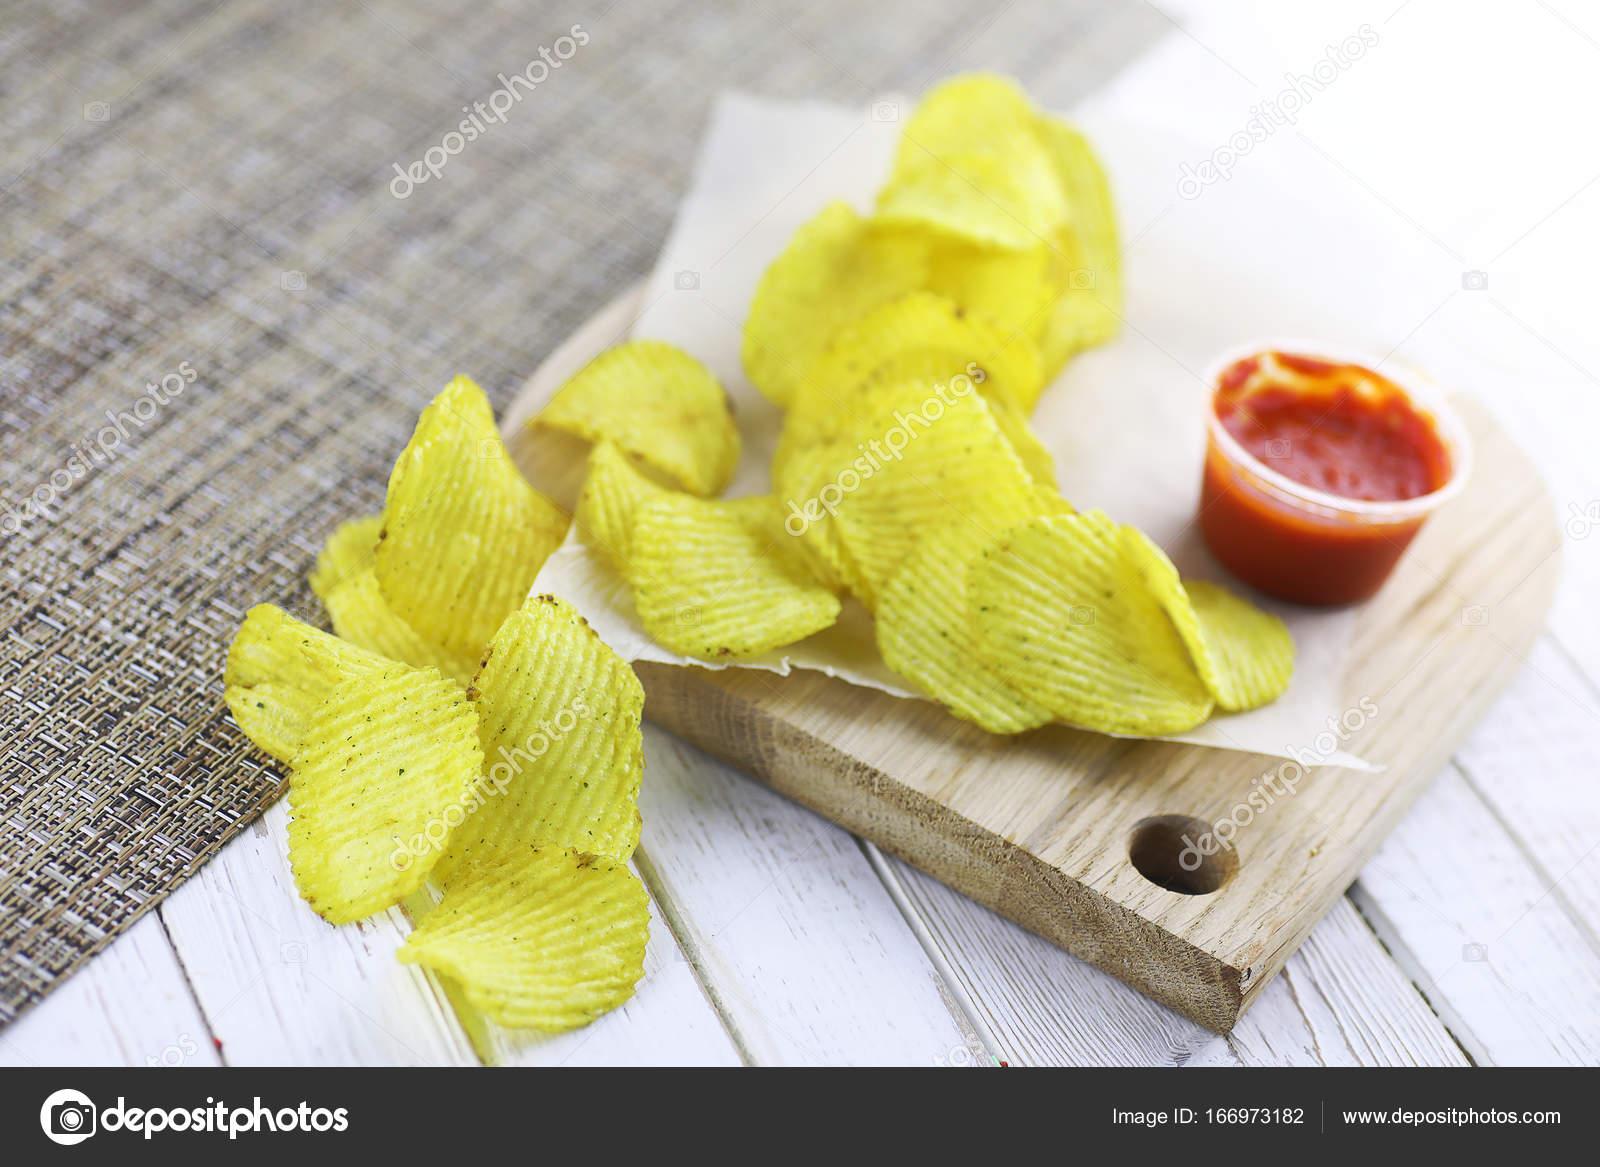 hamachi chip download